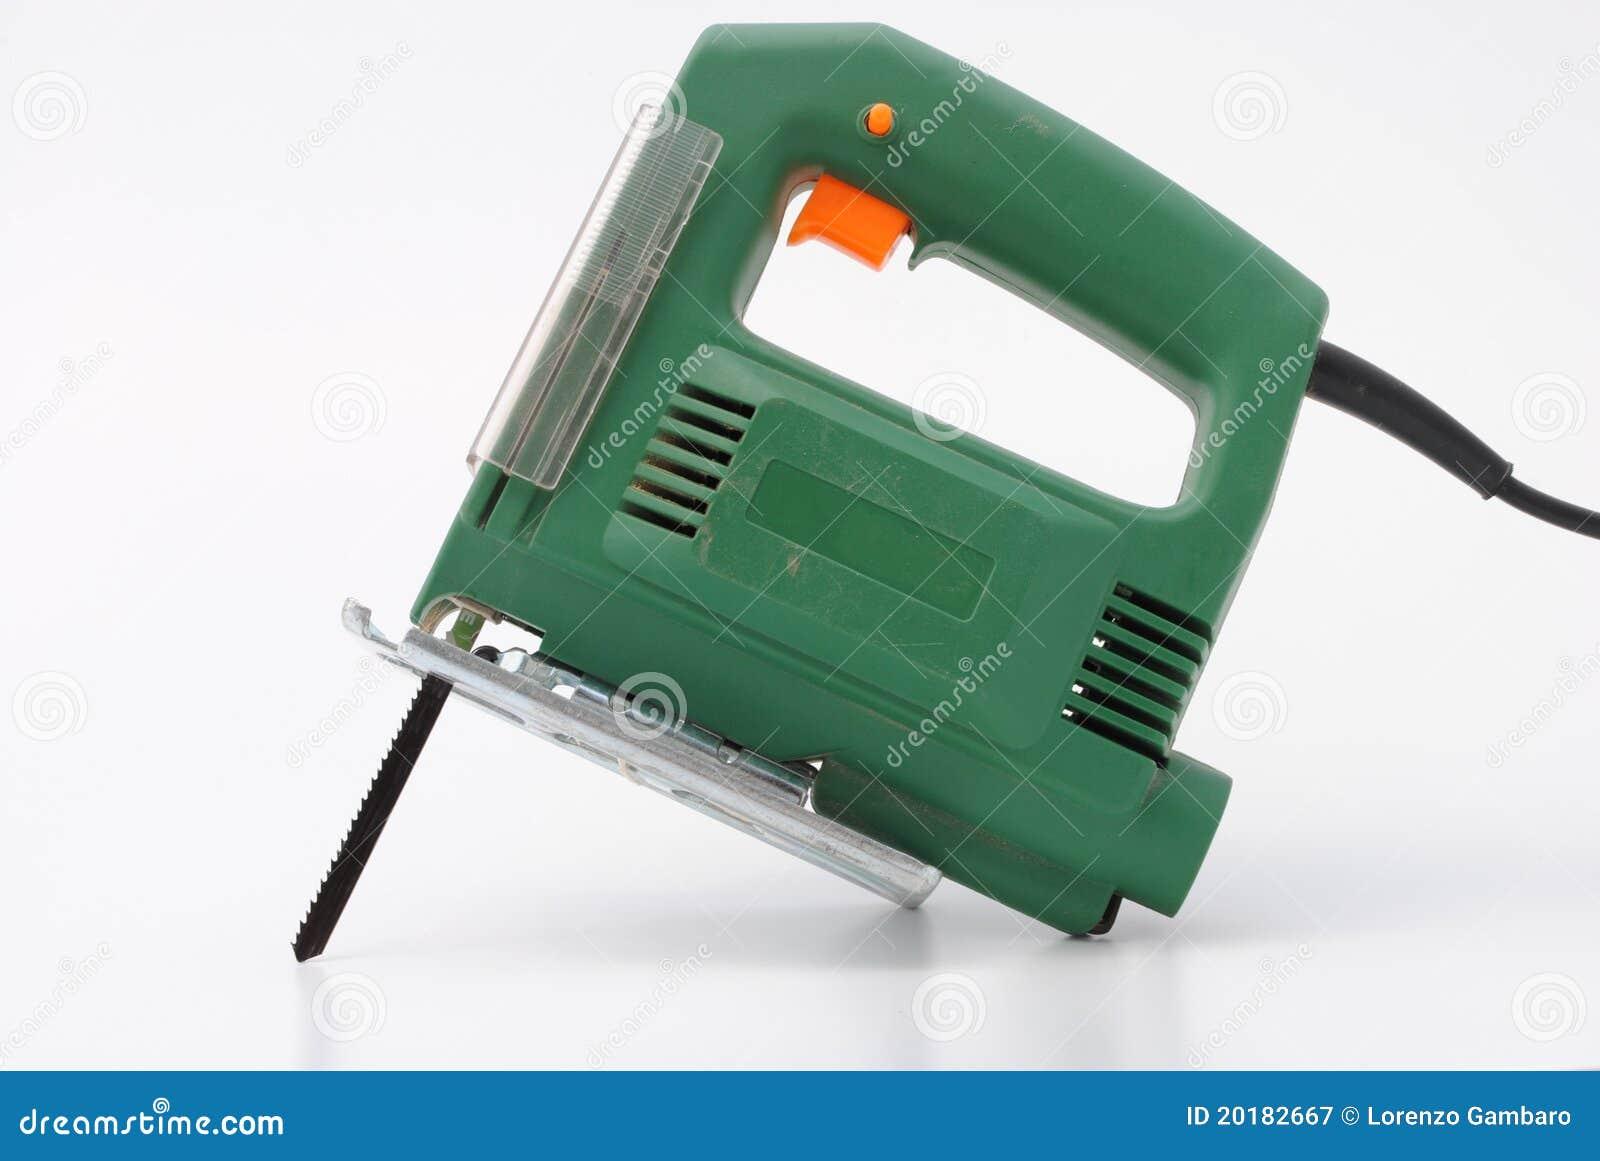 Cool Elektrische Grüne Metallsäge Lizenzfreie Stockfotografie - Bild  UJ07